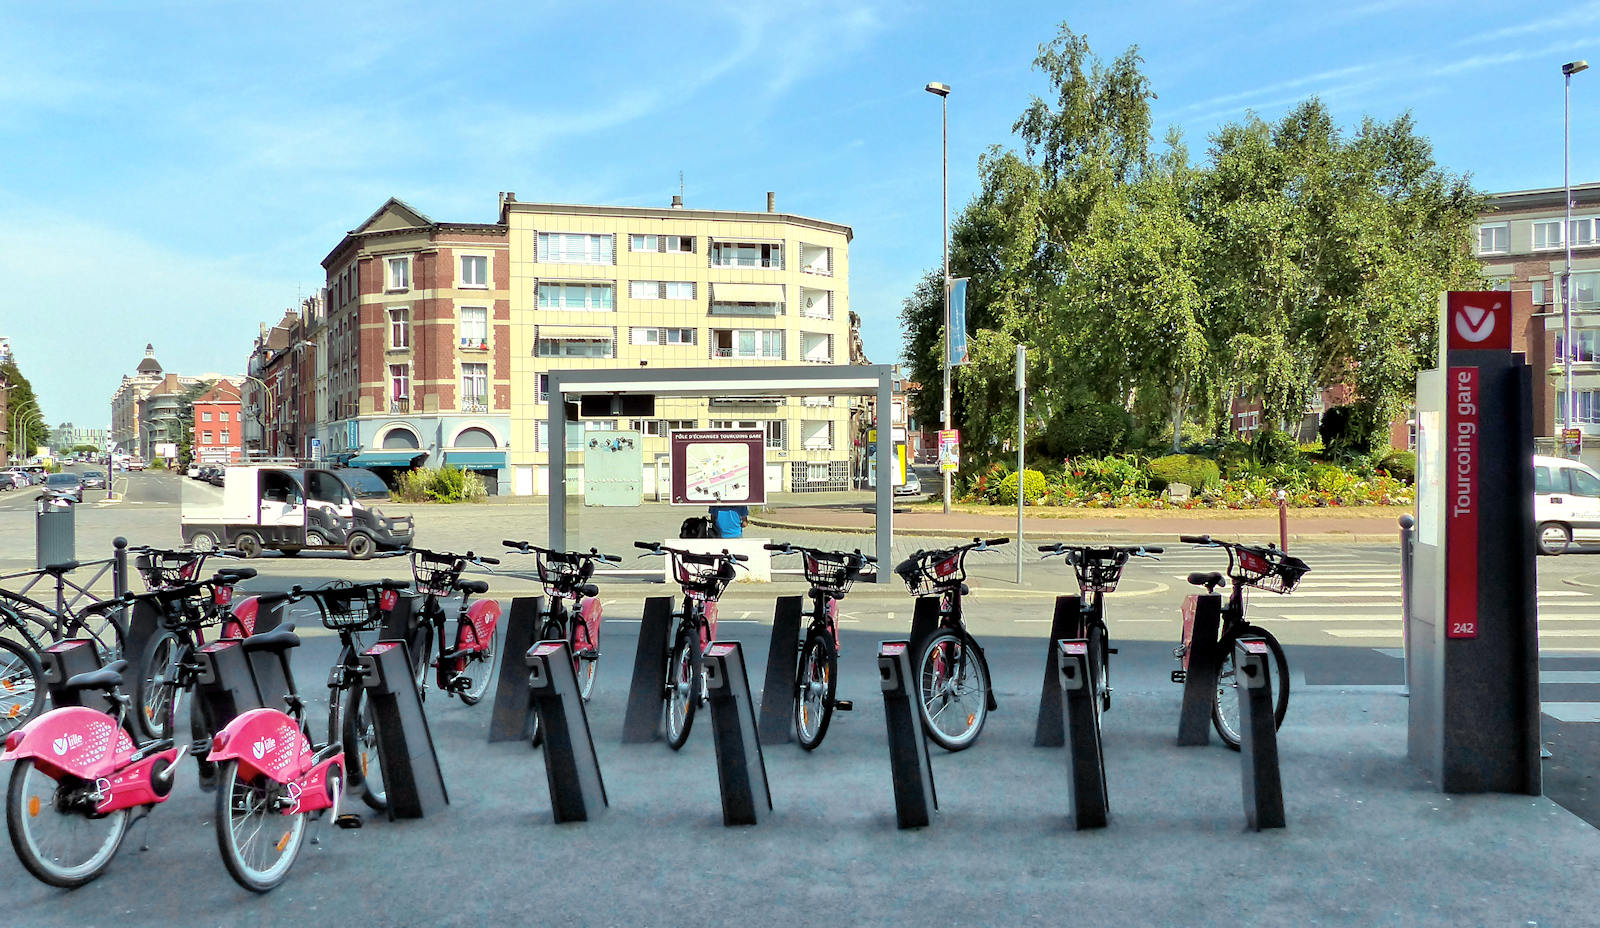 Gare - Station V'Lille, Tourcoing